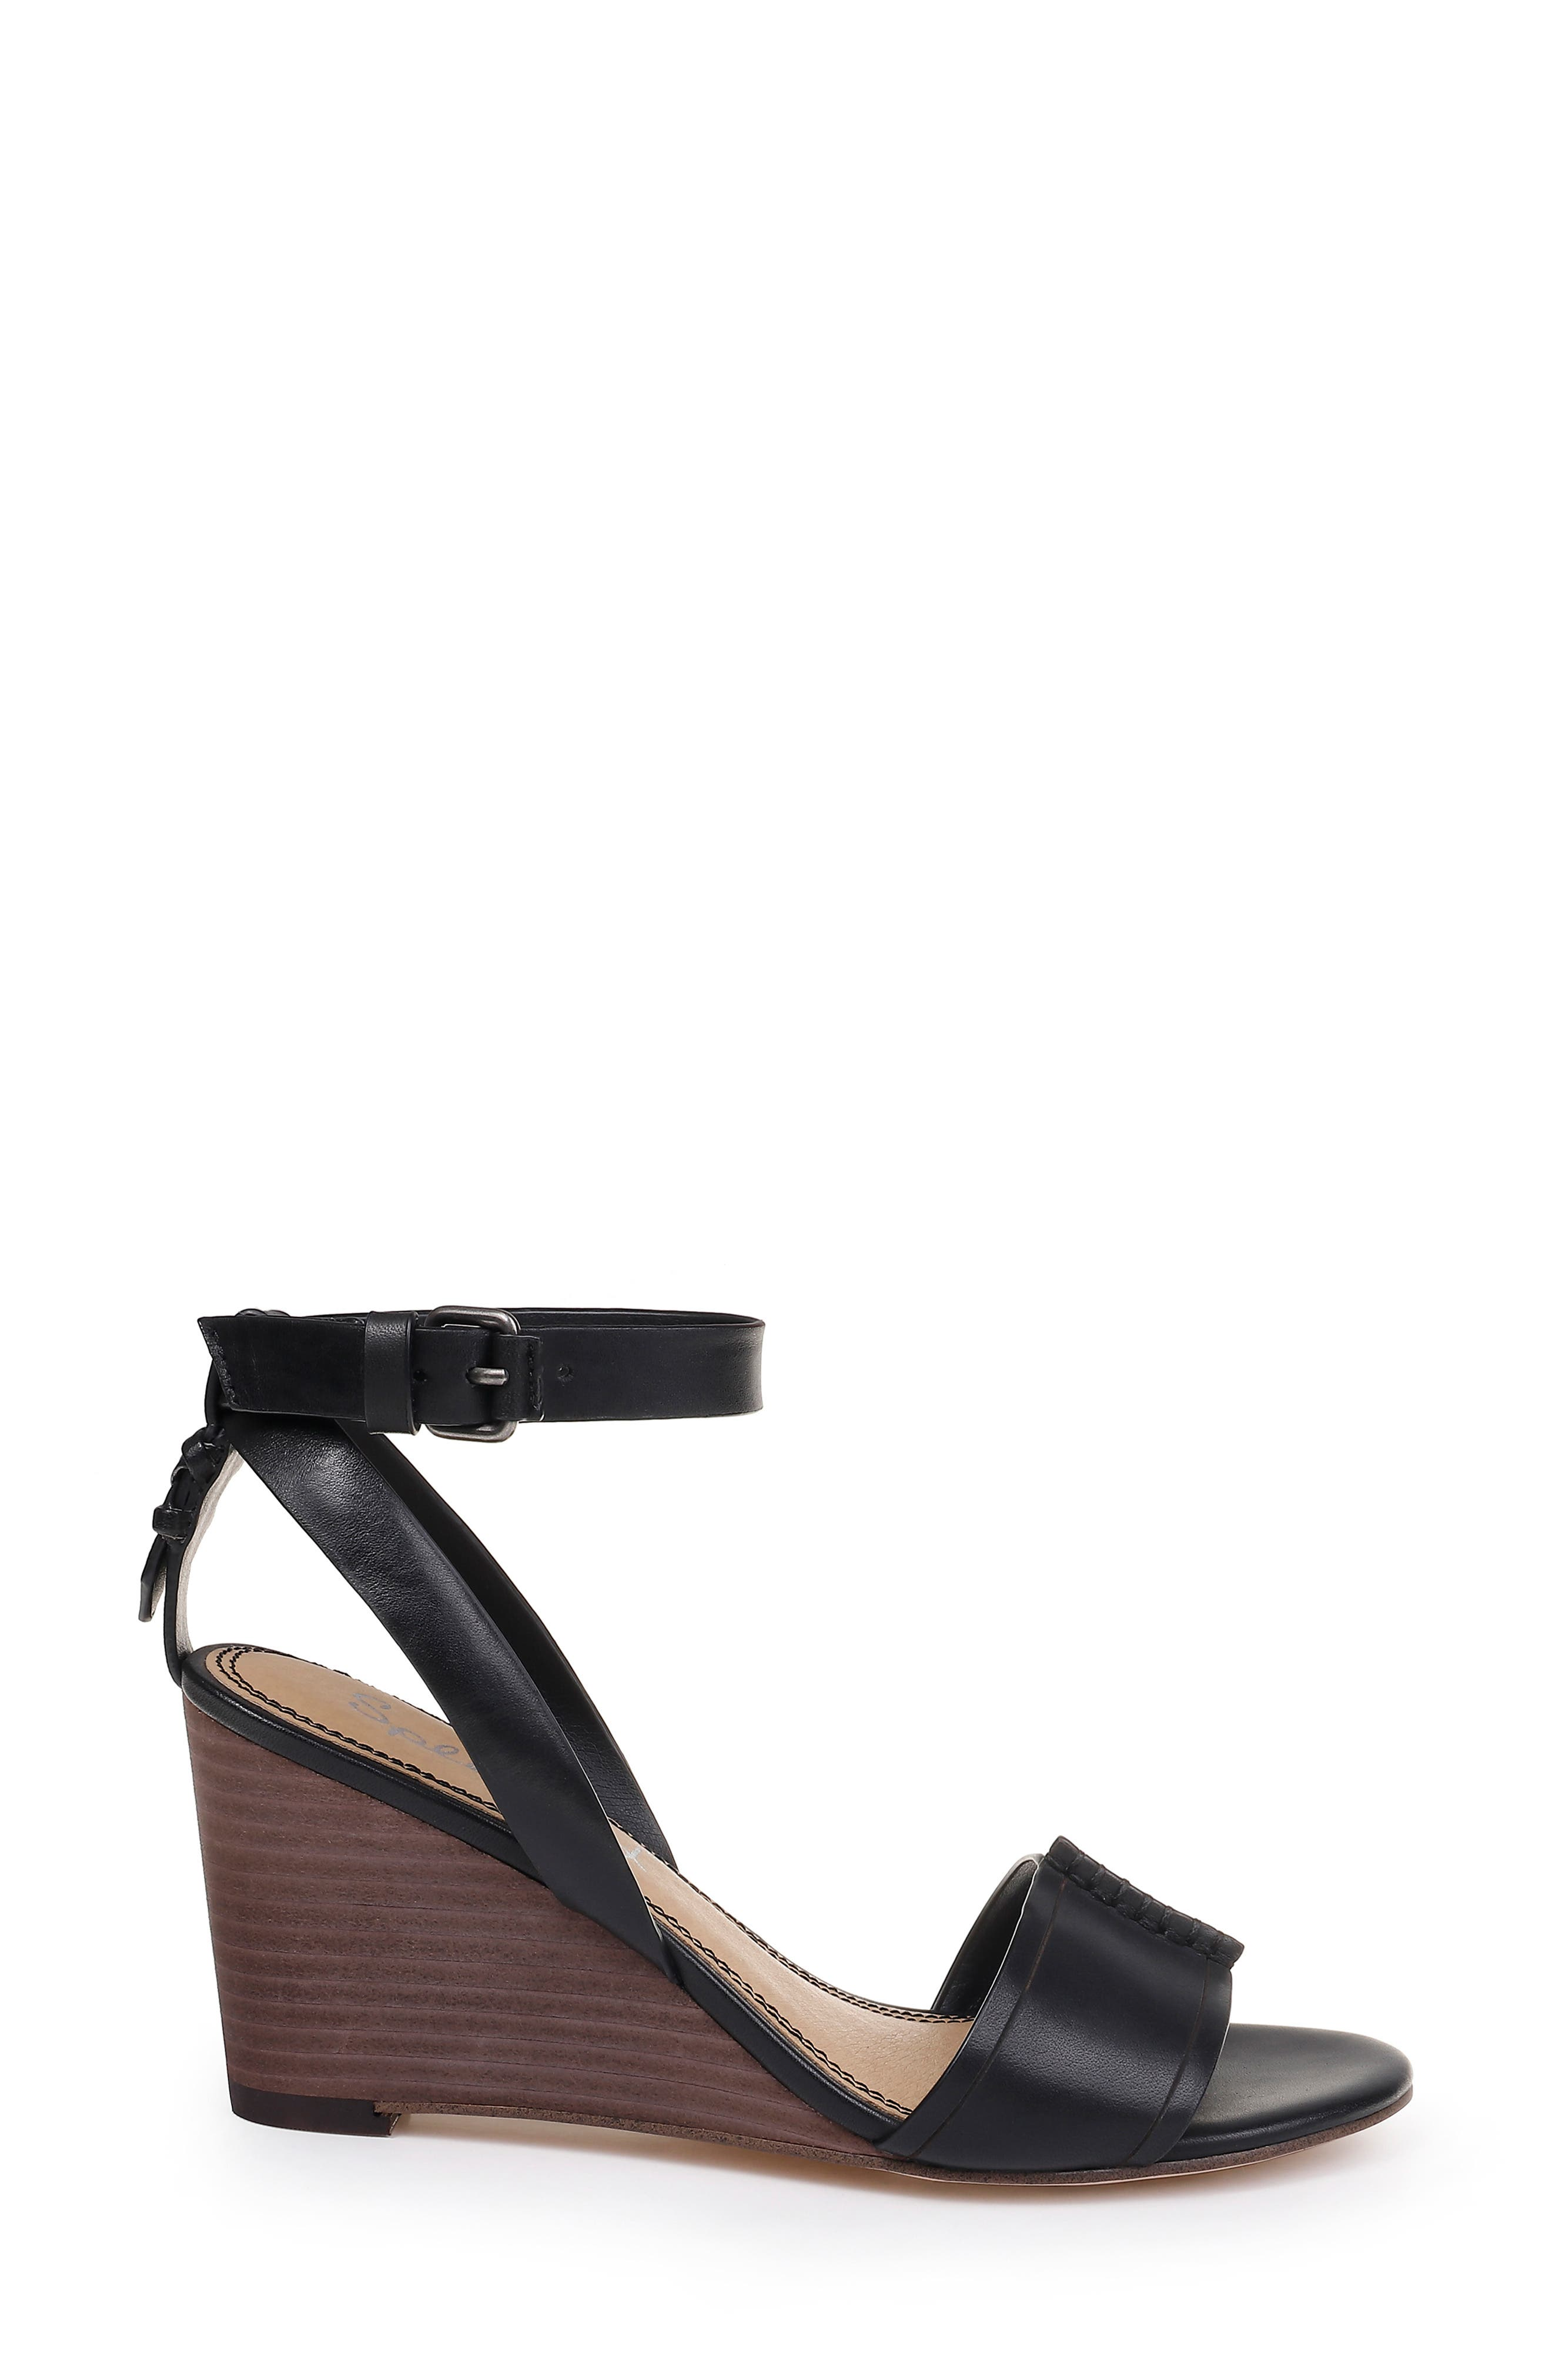 SPLENDID, Tadeo Wedge Ankle Strap Sandal, Alternate thumbnail 3, color, BLACK LEATHER